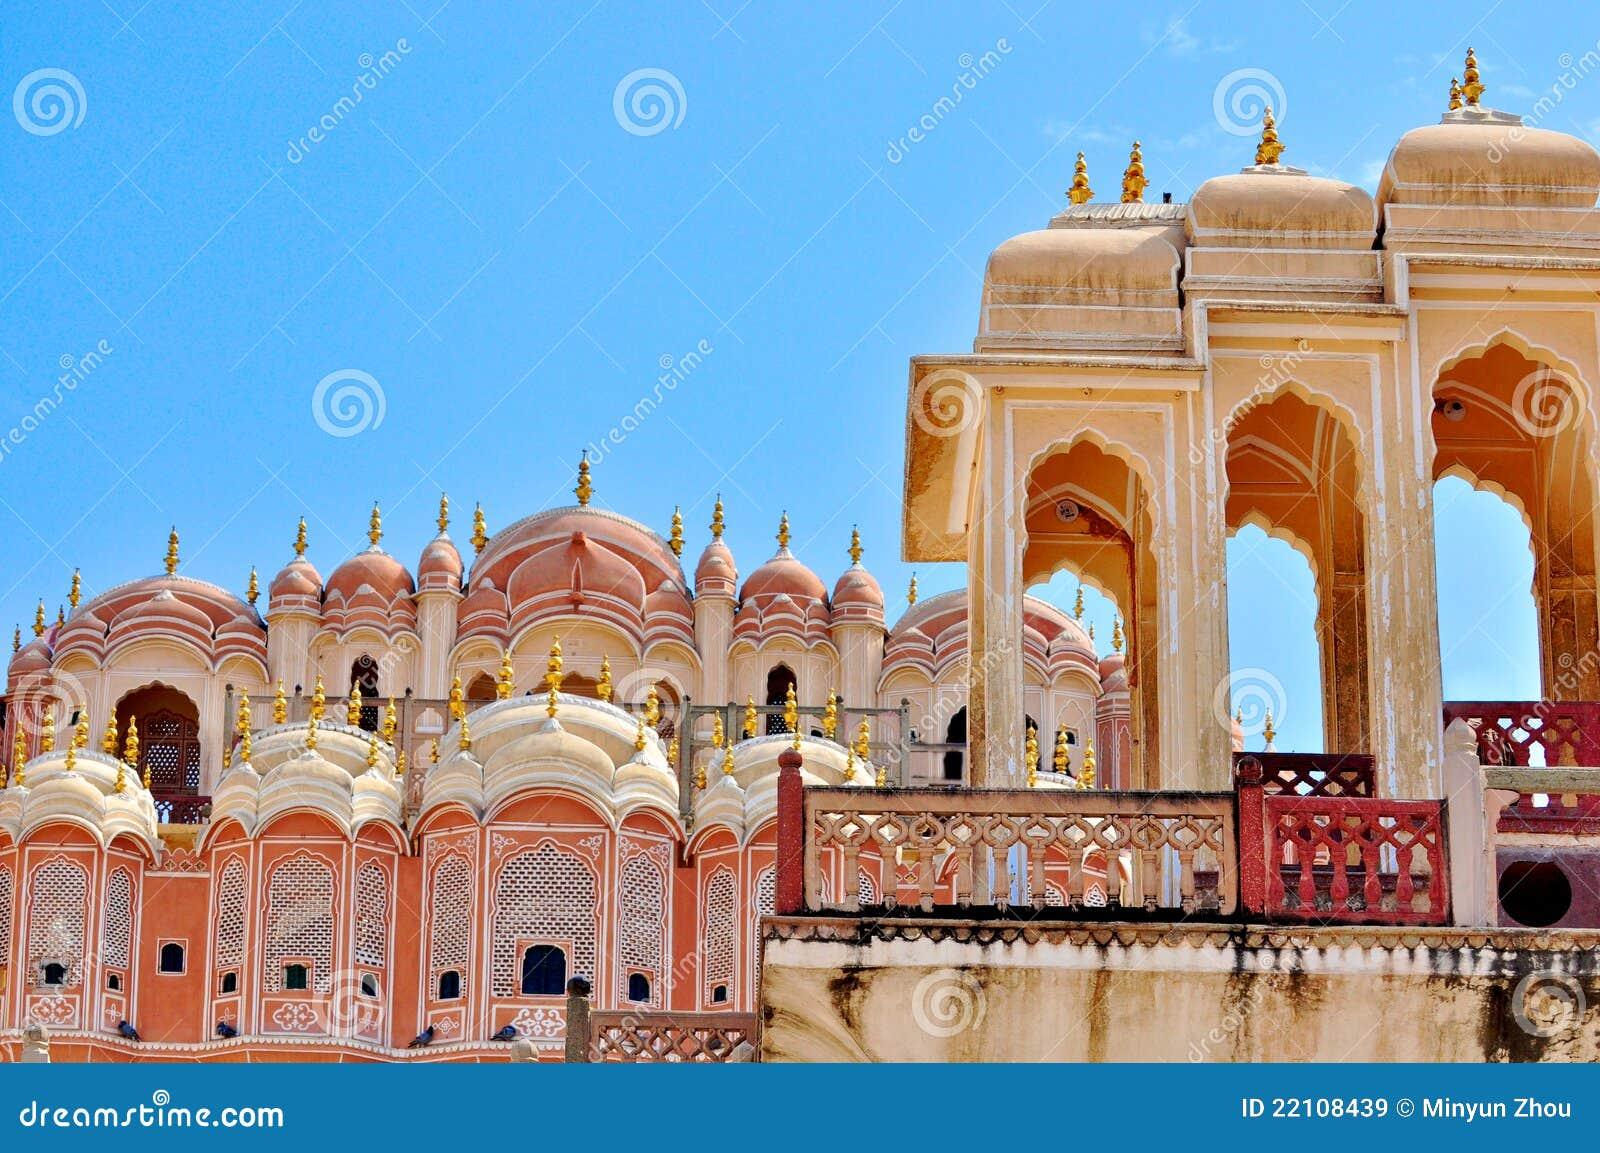 free jaipuri india